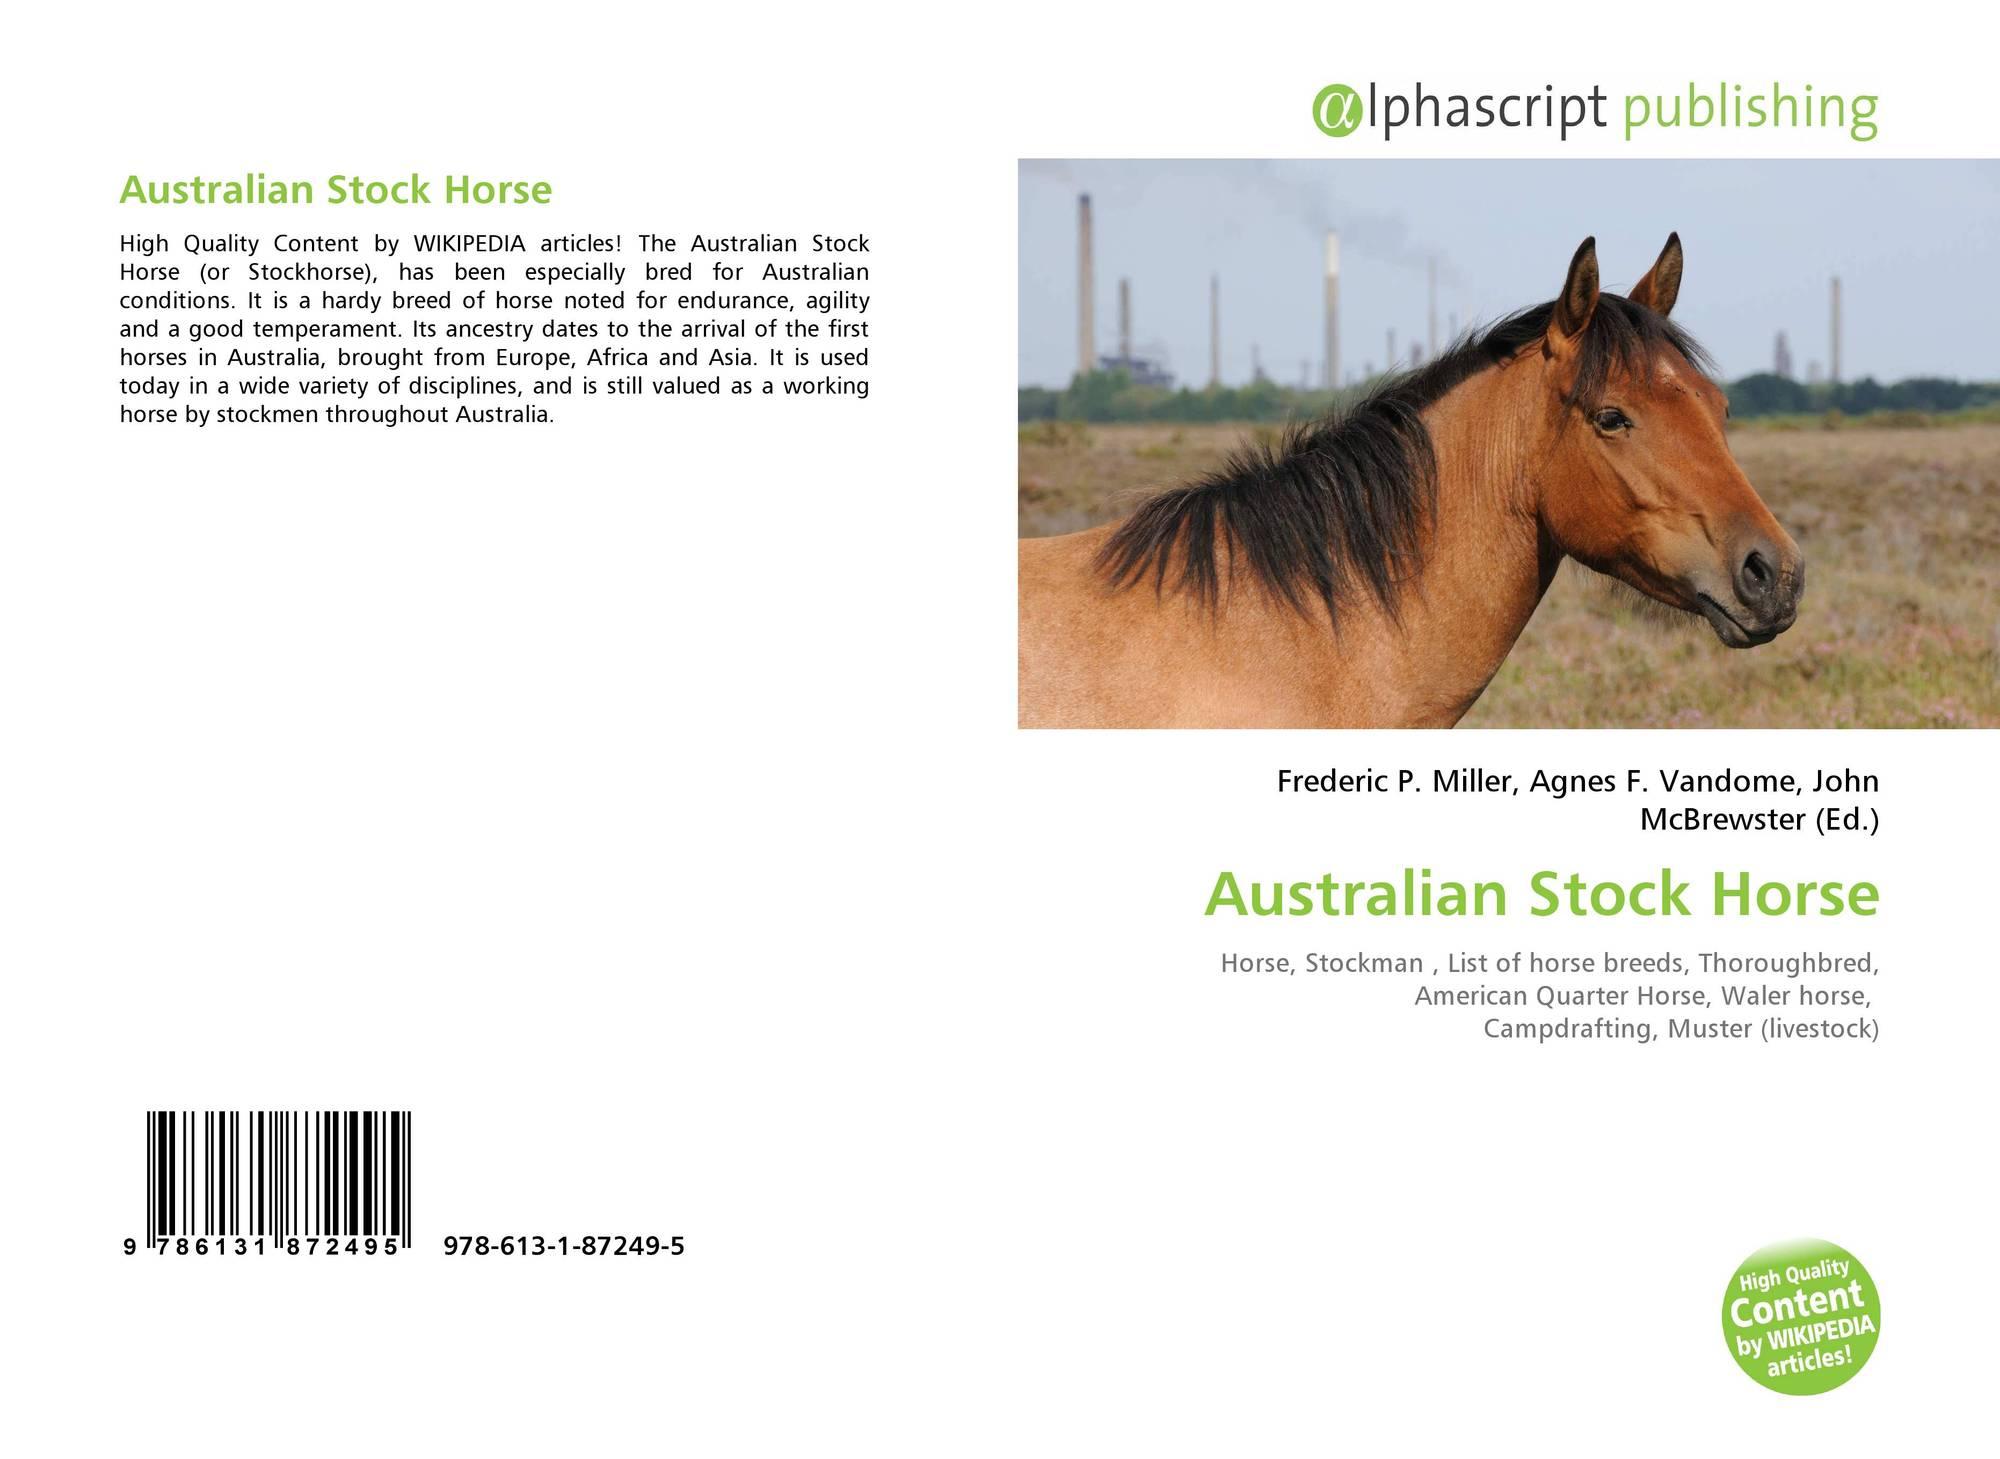 Australian Stock Horse 978 613 1 87249 5 613187249x 9786131872495